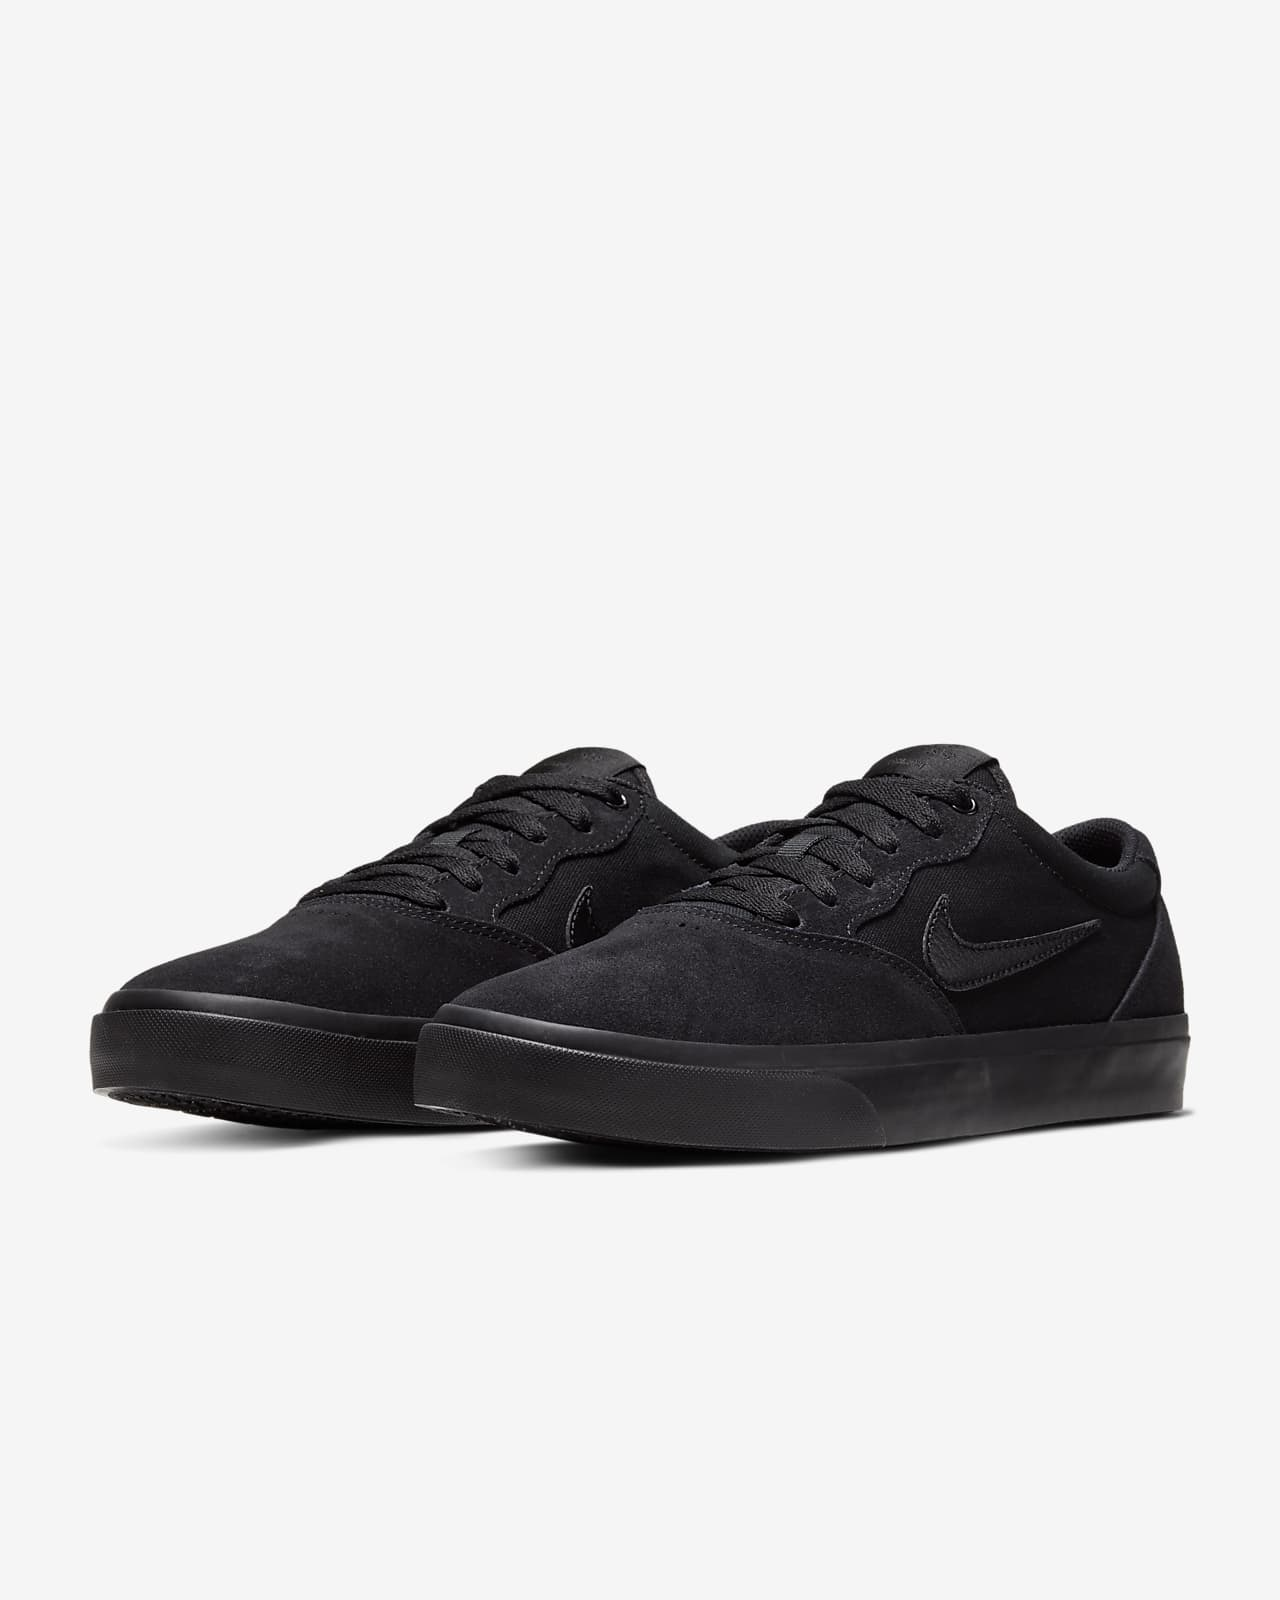 Nike SB Chron Solarsoft Skate Shoes